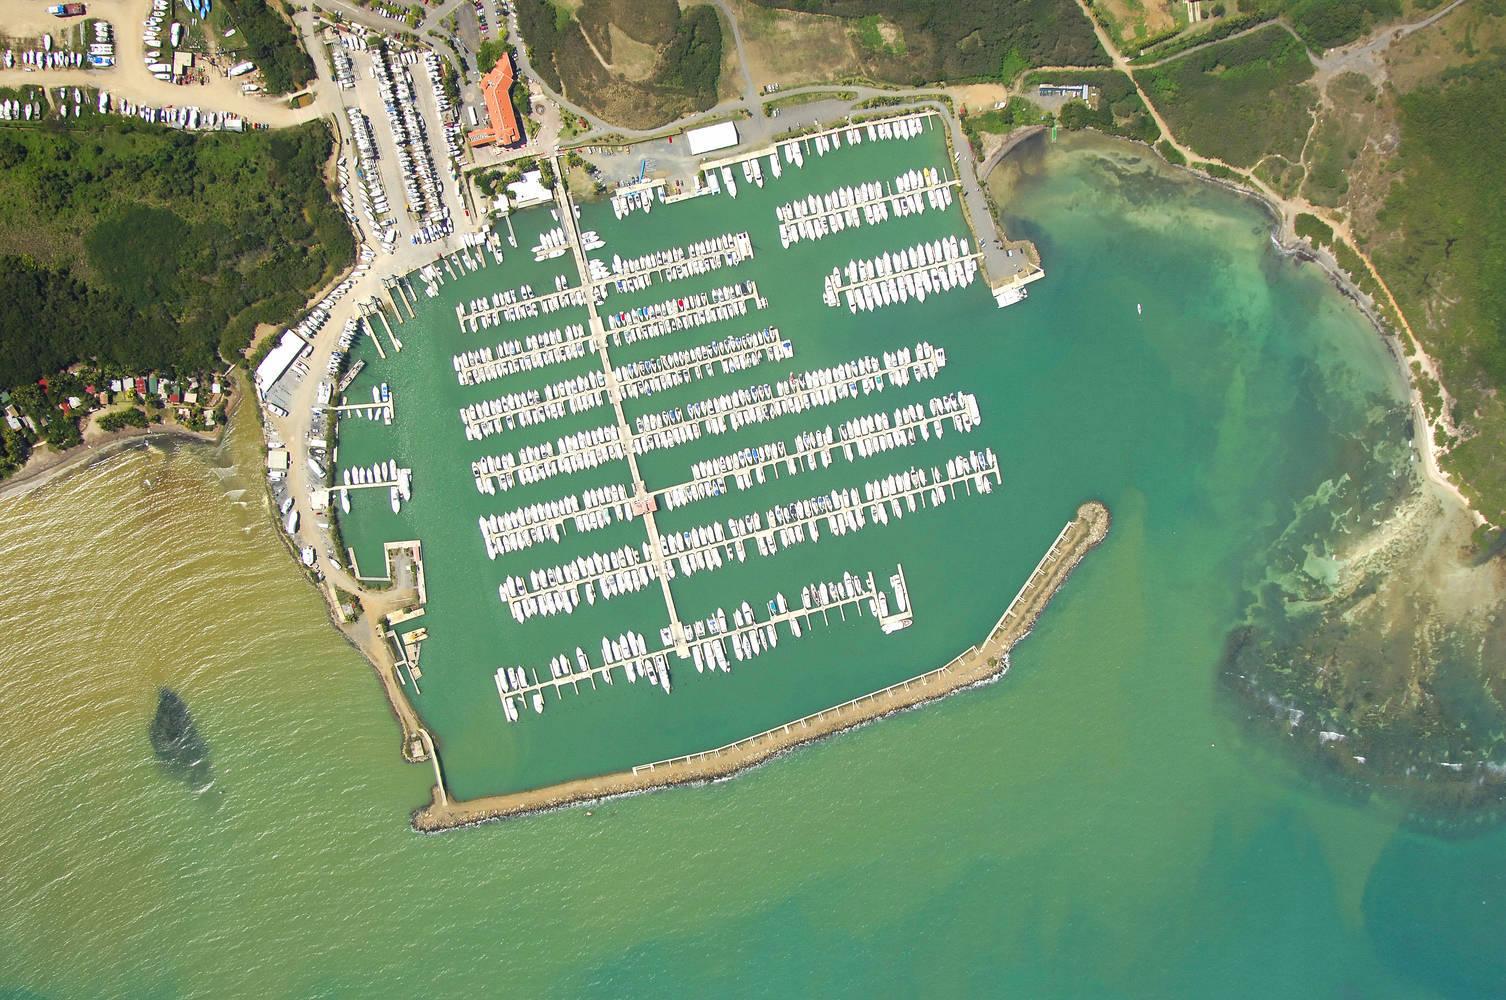 Bermuda Car Rental >> Puerto del Rey Marina slip, dock, mooring reservations ...